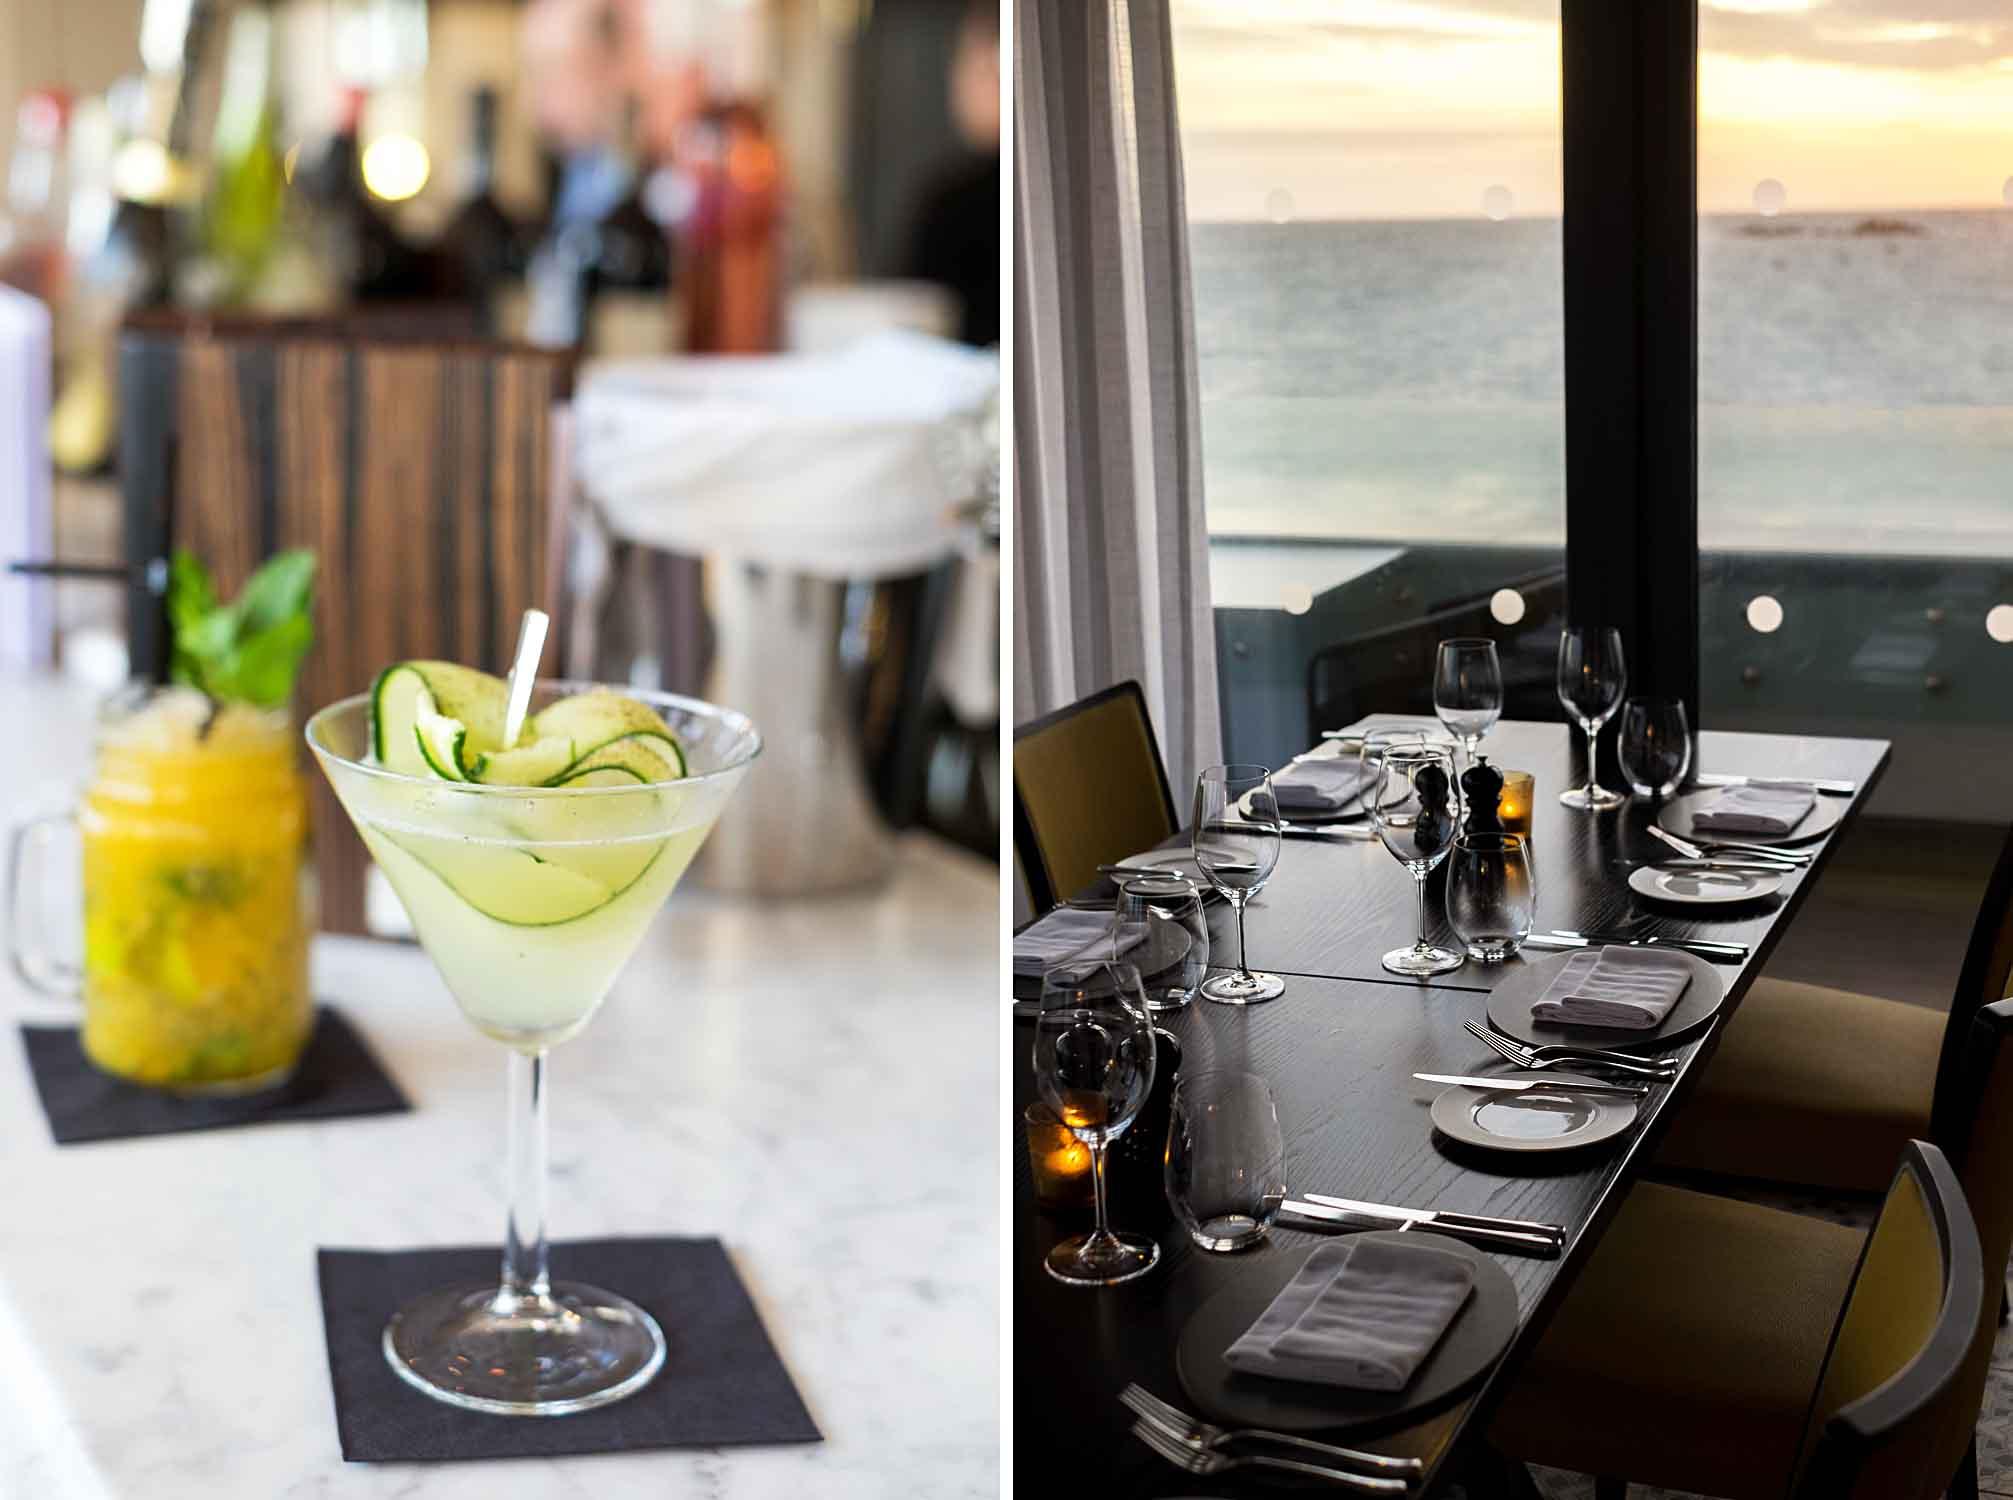 La Reunion restaurant - Guernsey, Channel Islands